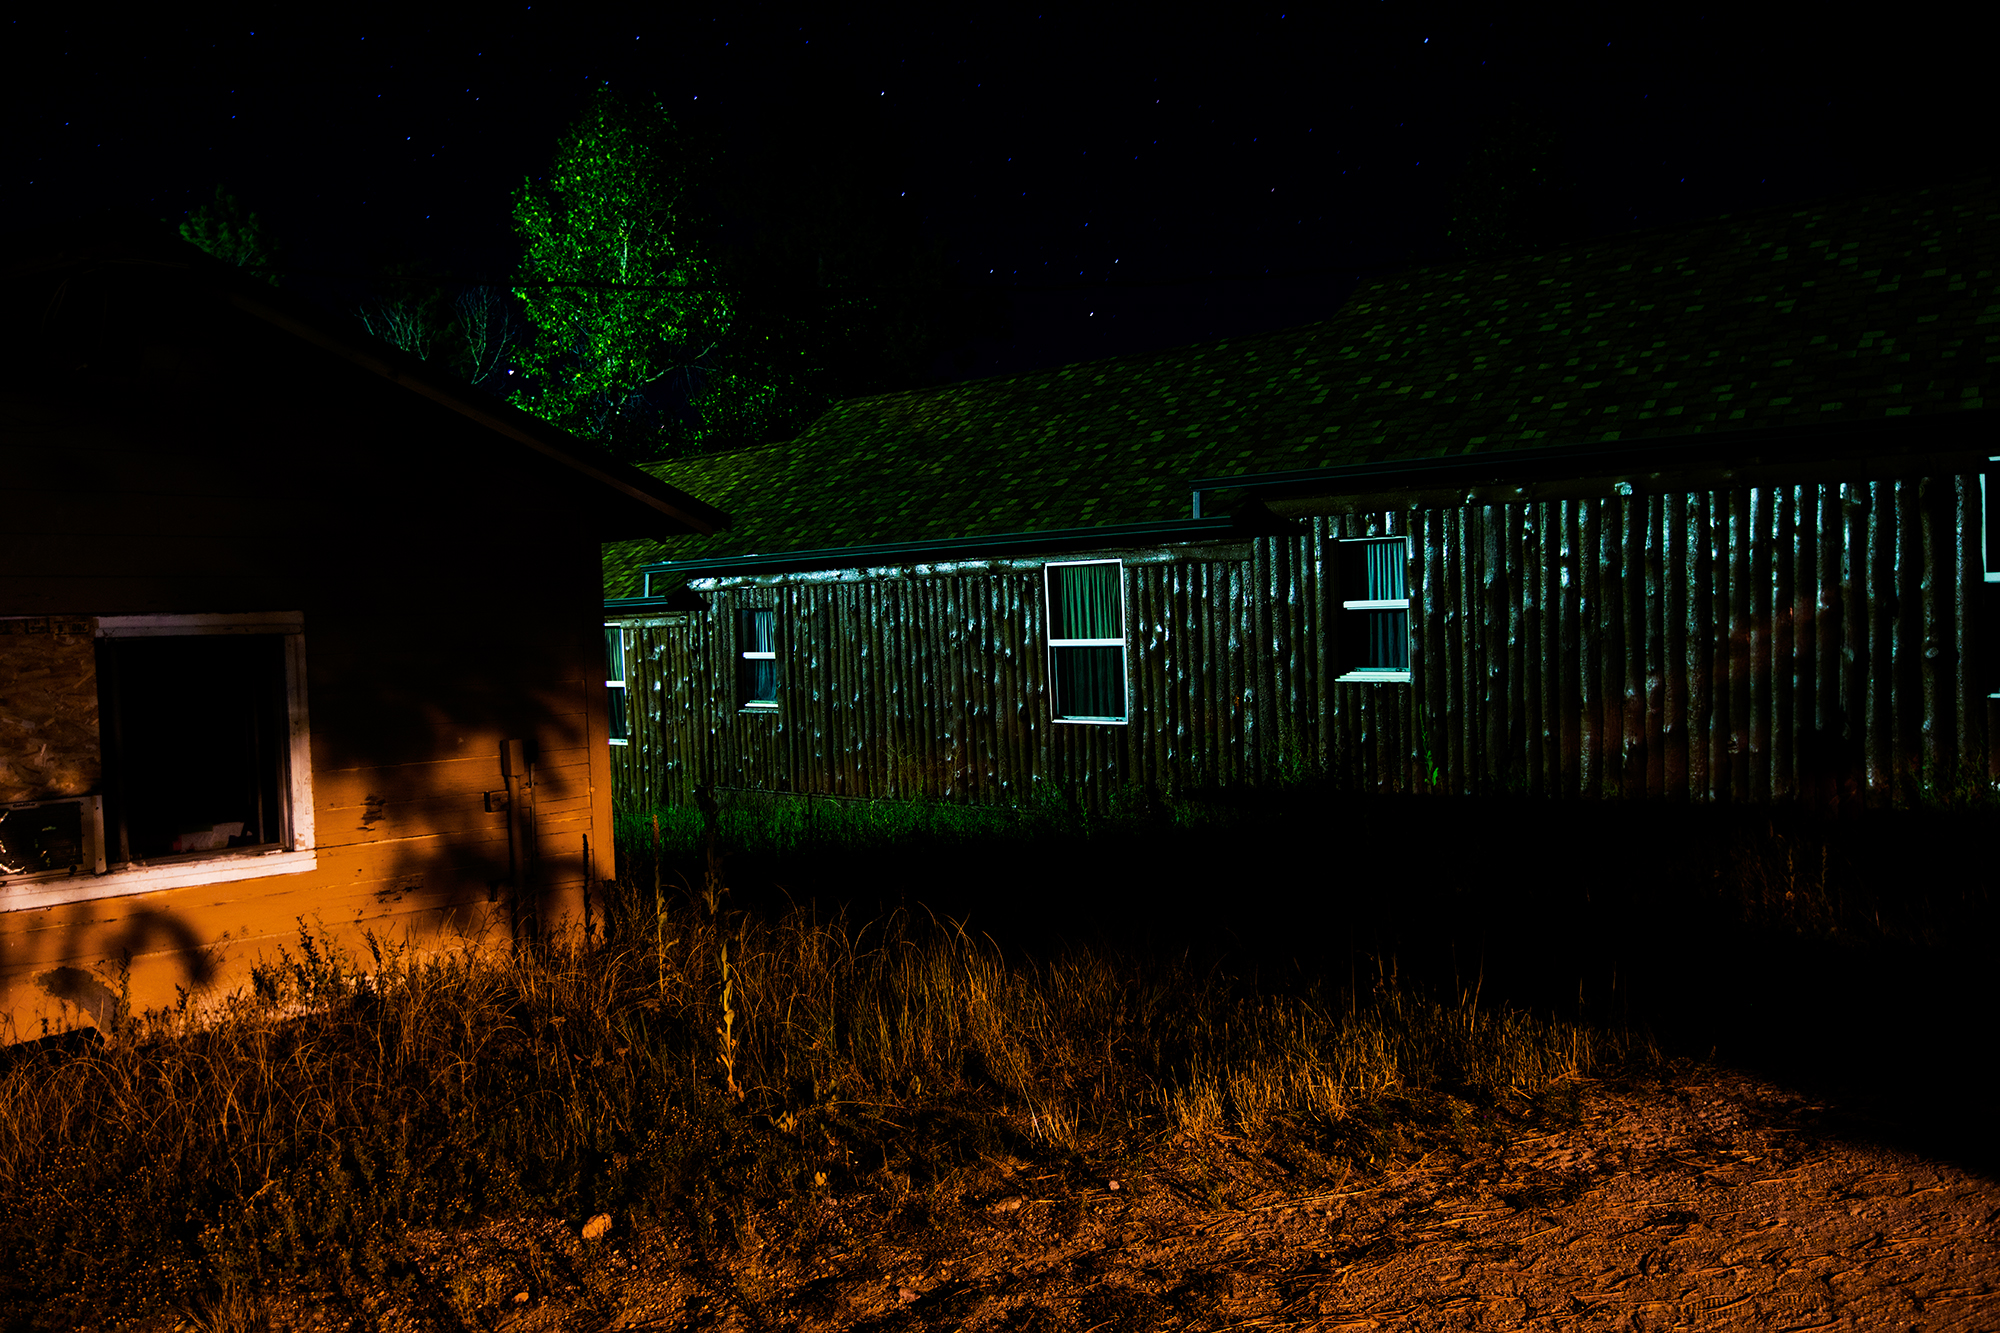 Remi Thornton, Cabin Windows. From JCC Ranch. Courtesy of Remi Thornton.